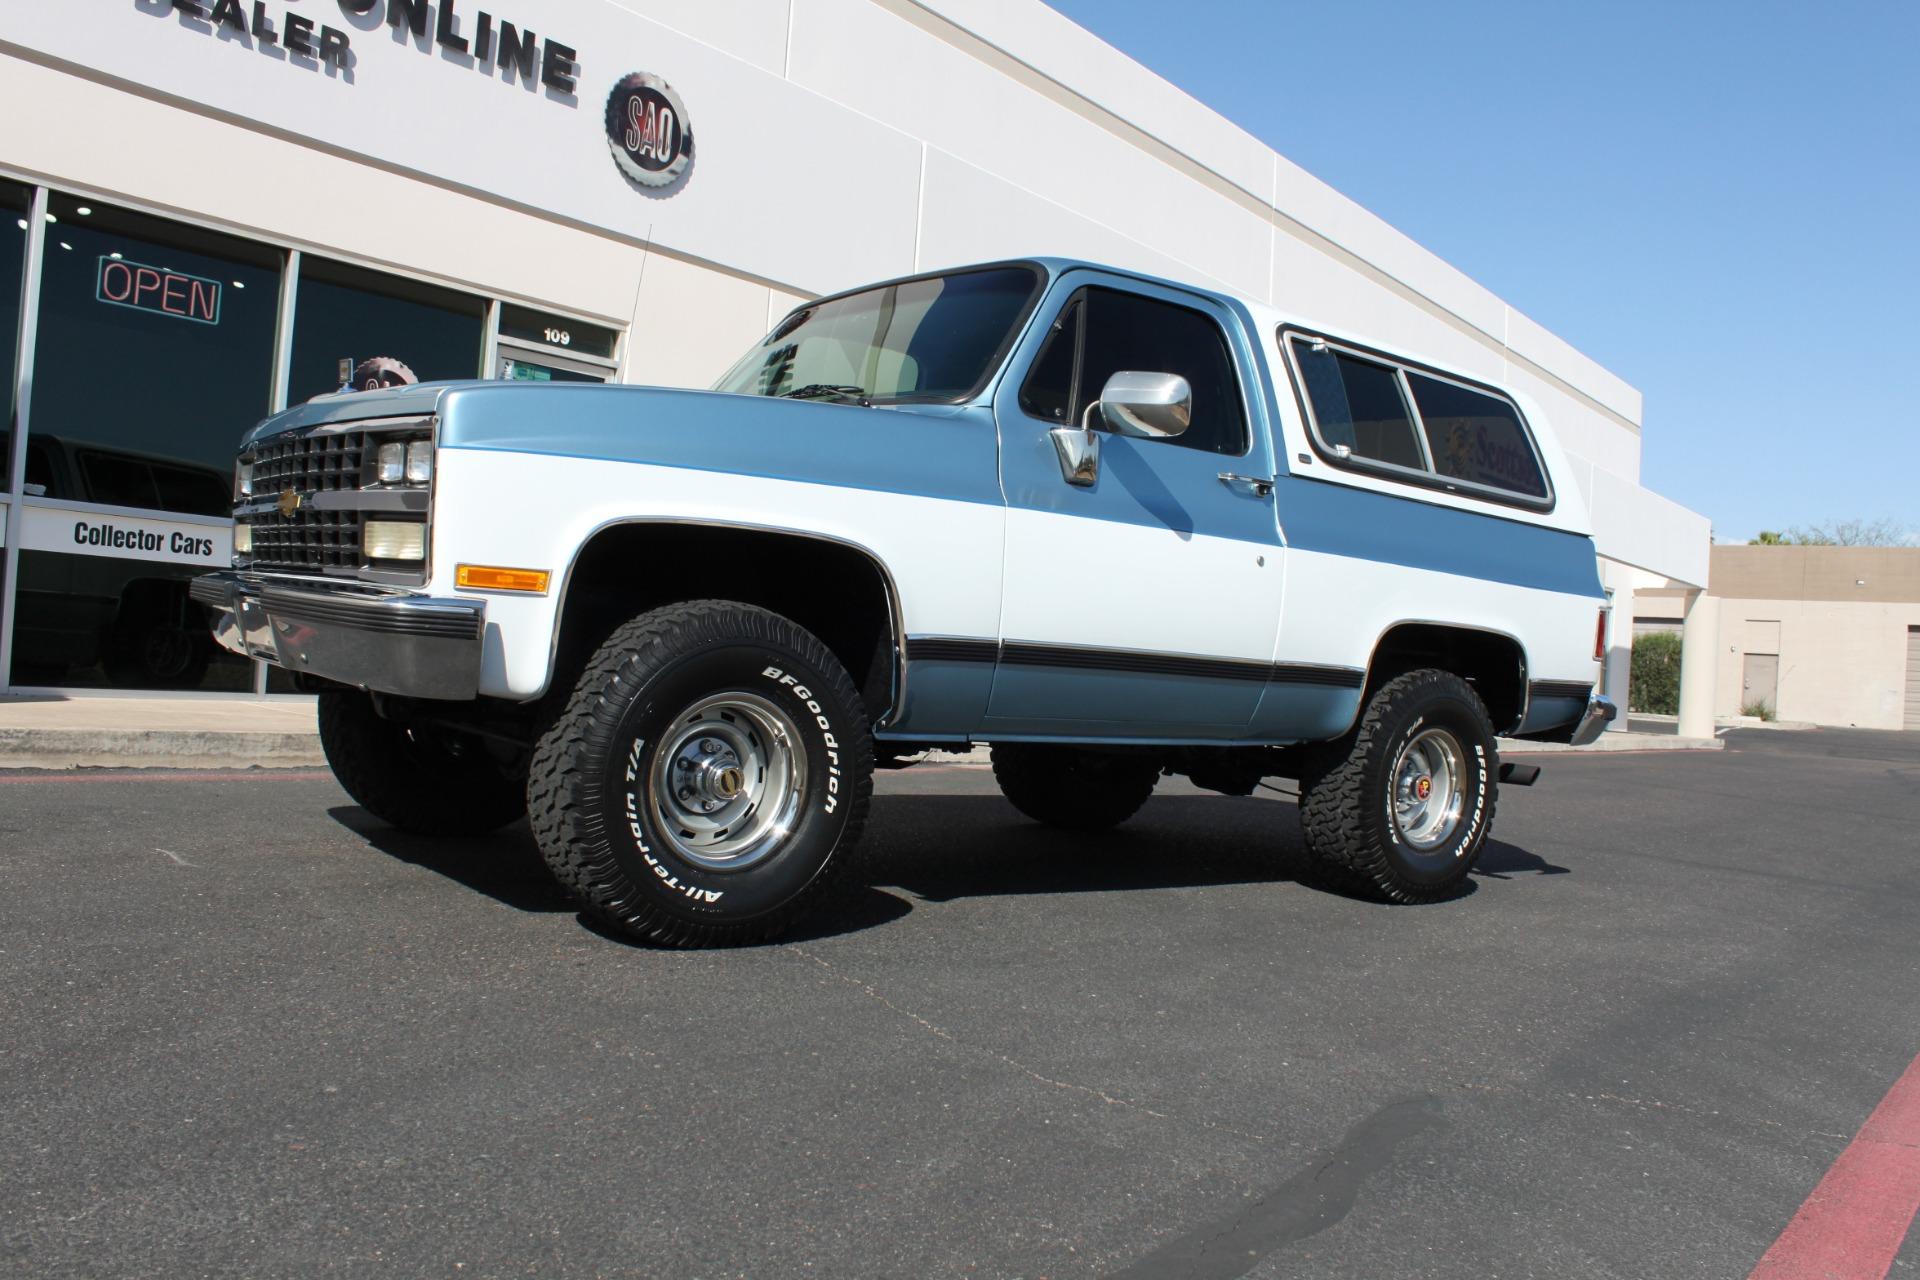 Used-1989-Chevrolet-K5-Blazer-4X4-Lexus